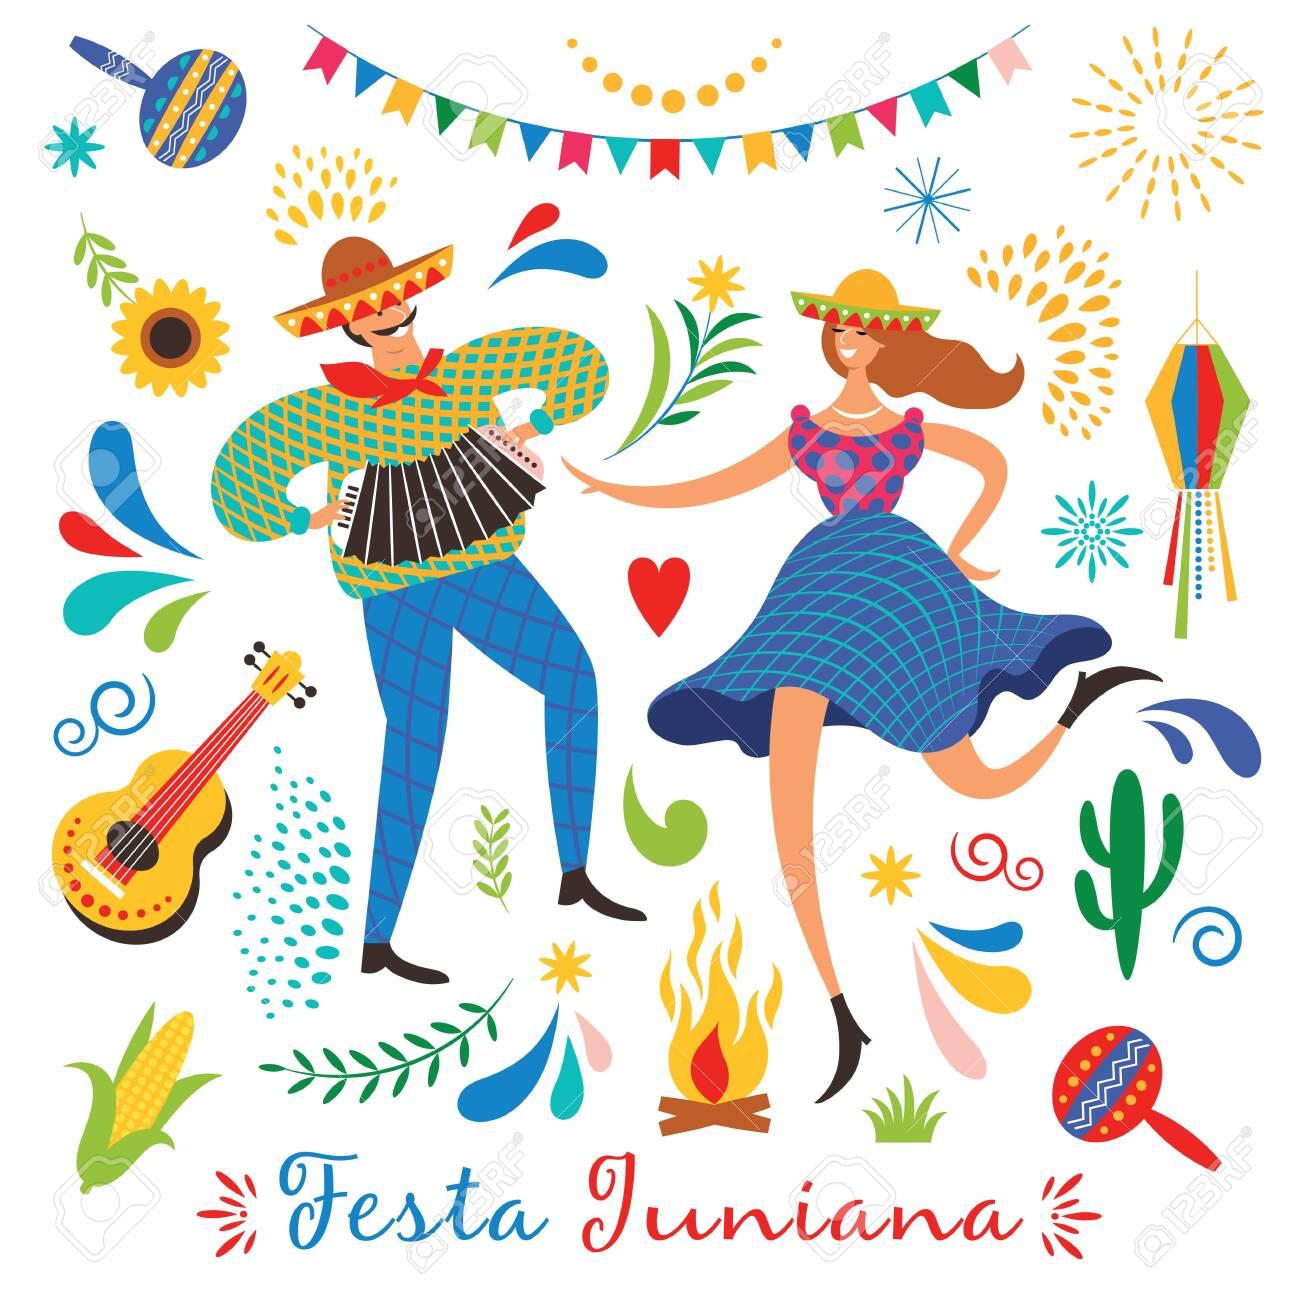 Festa Junina.The June party of Brazil. Festive Mood. Brazil carnival. Set of festive vector elements, guitar, corn, fire, lantern, dansing man and woman - 124560174